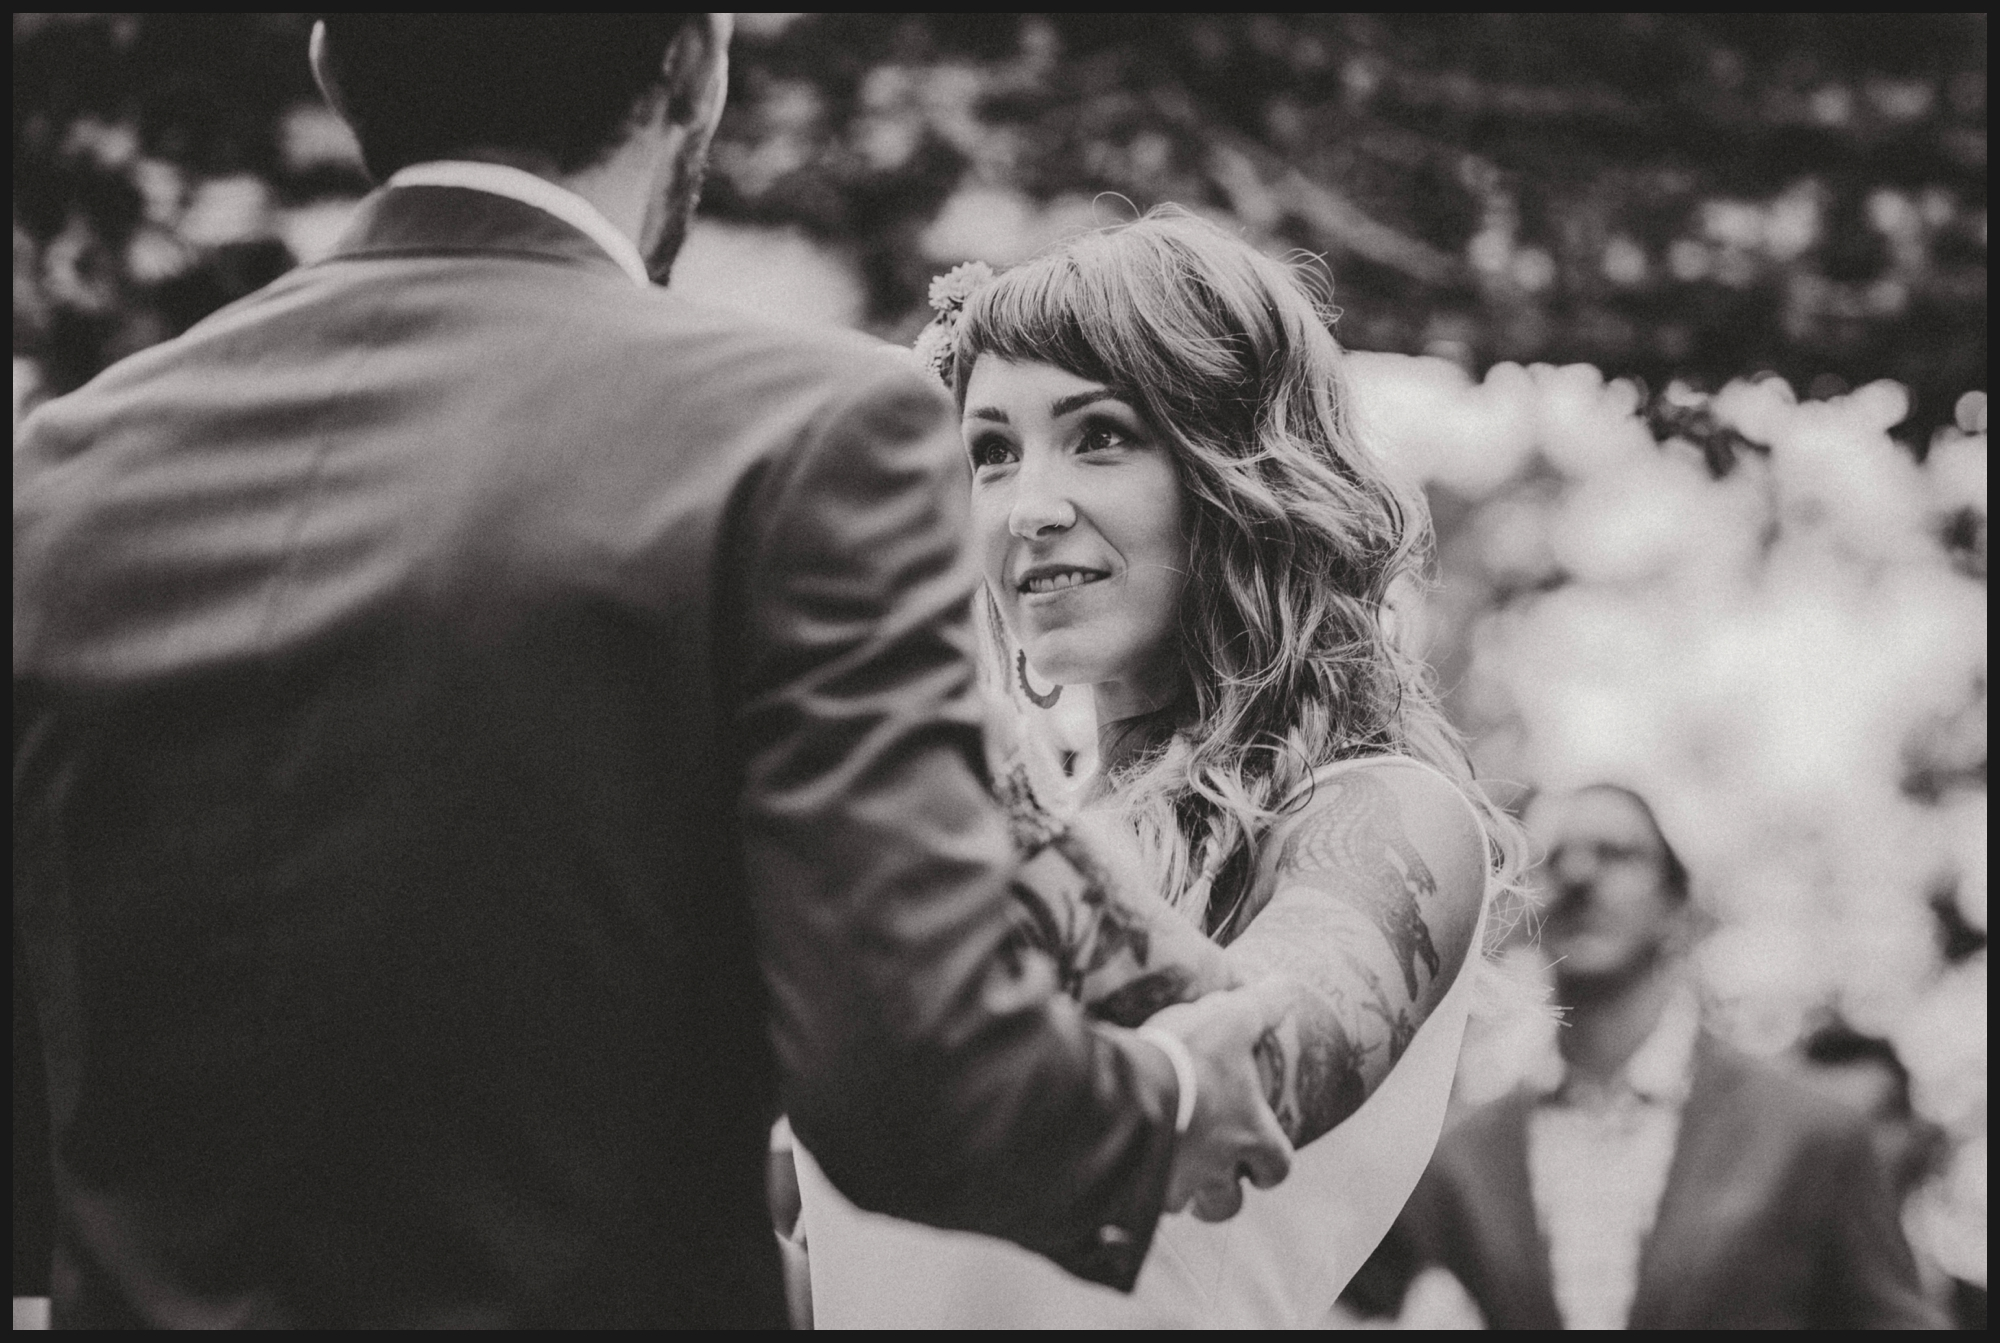 Orlando-Wedding-Photographer-destination-wedding-photographer-florida-wedding-photographer-bohemian-wedding-photographer_2037.jpg